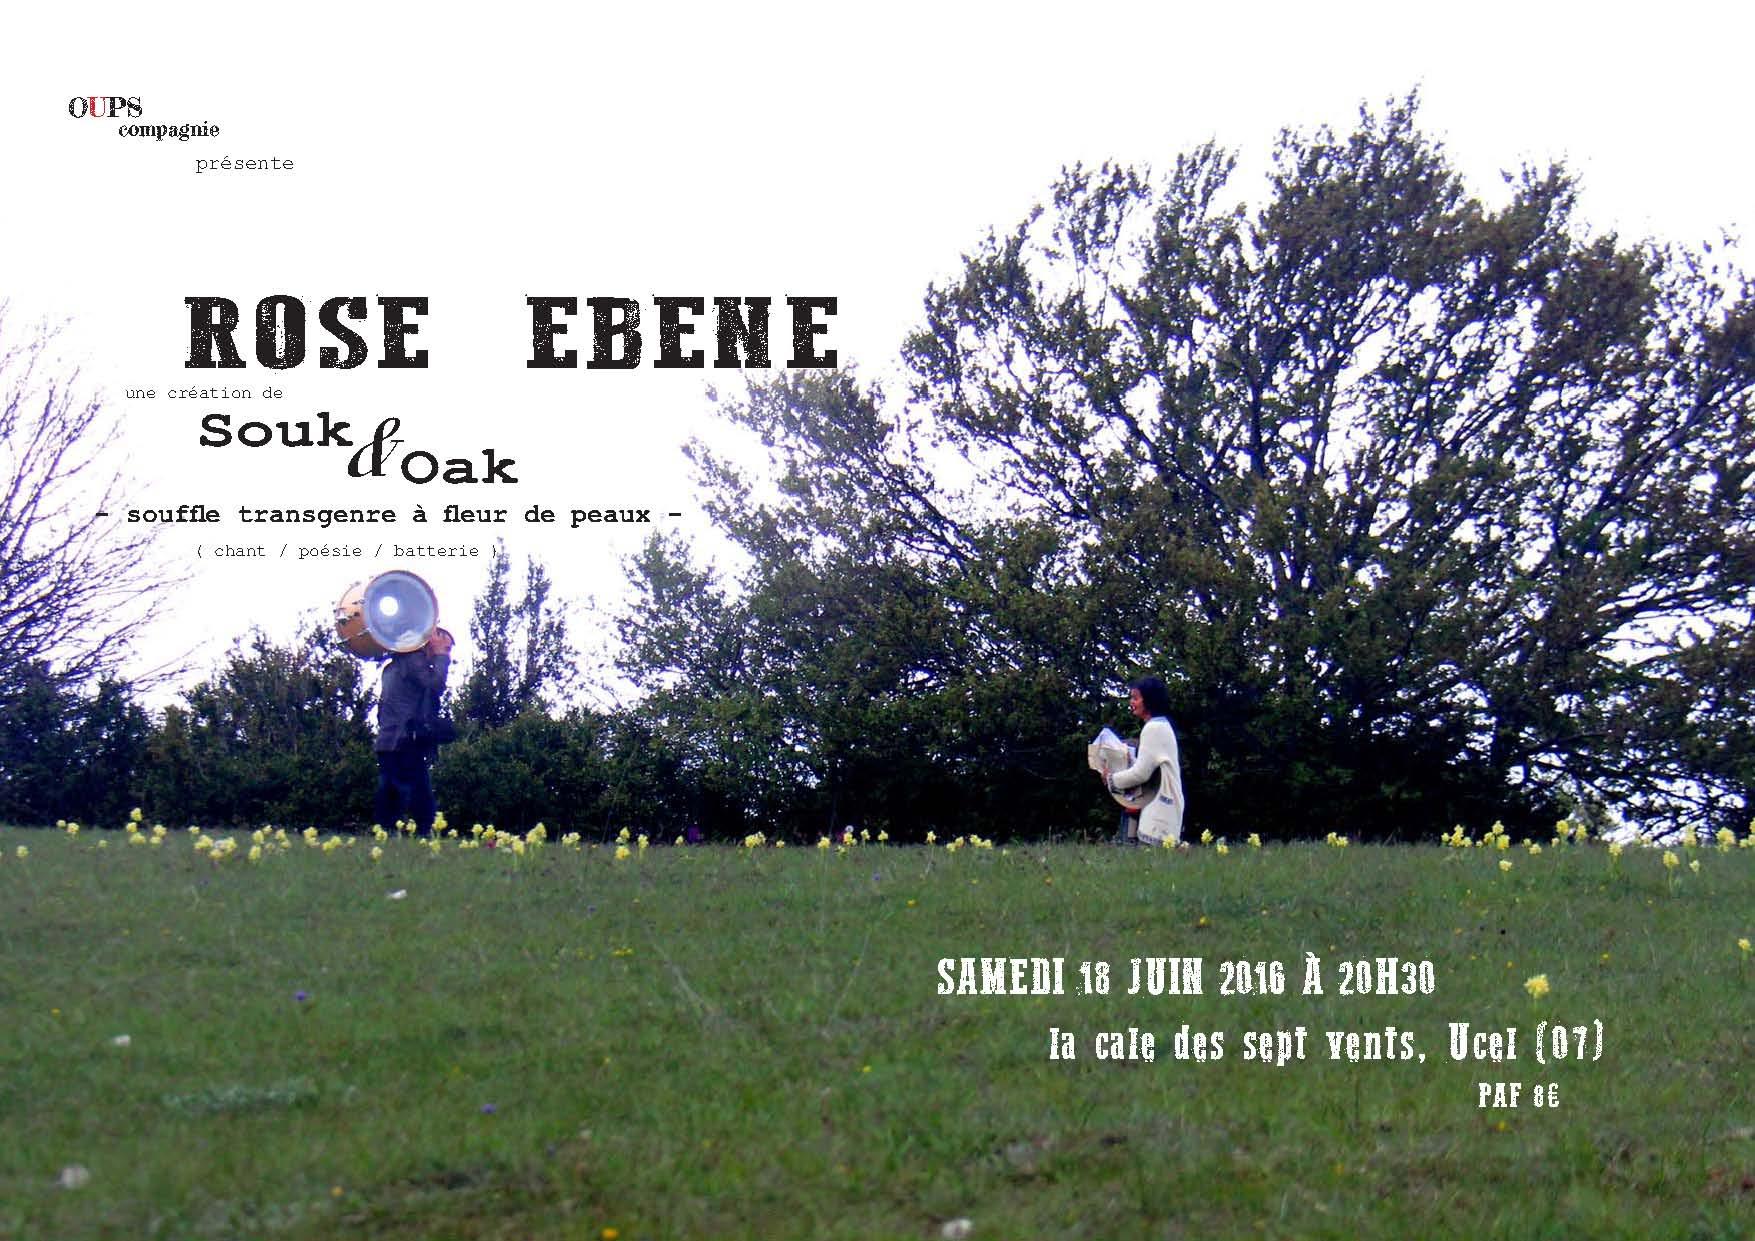 Affichea4 ROSE EBENE 18 juin